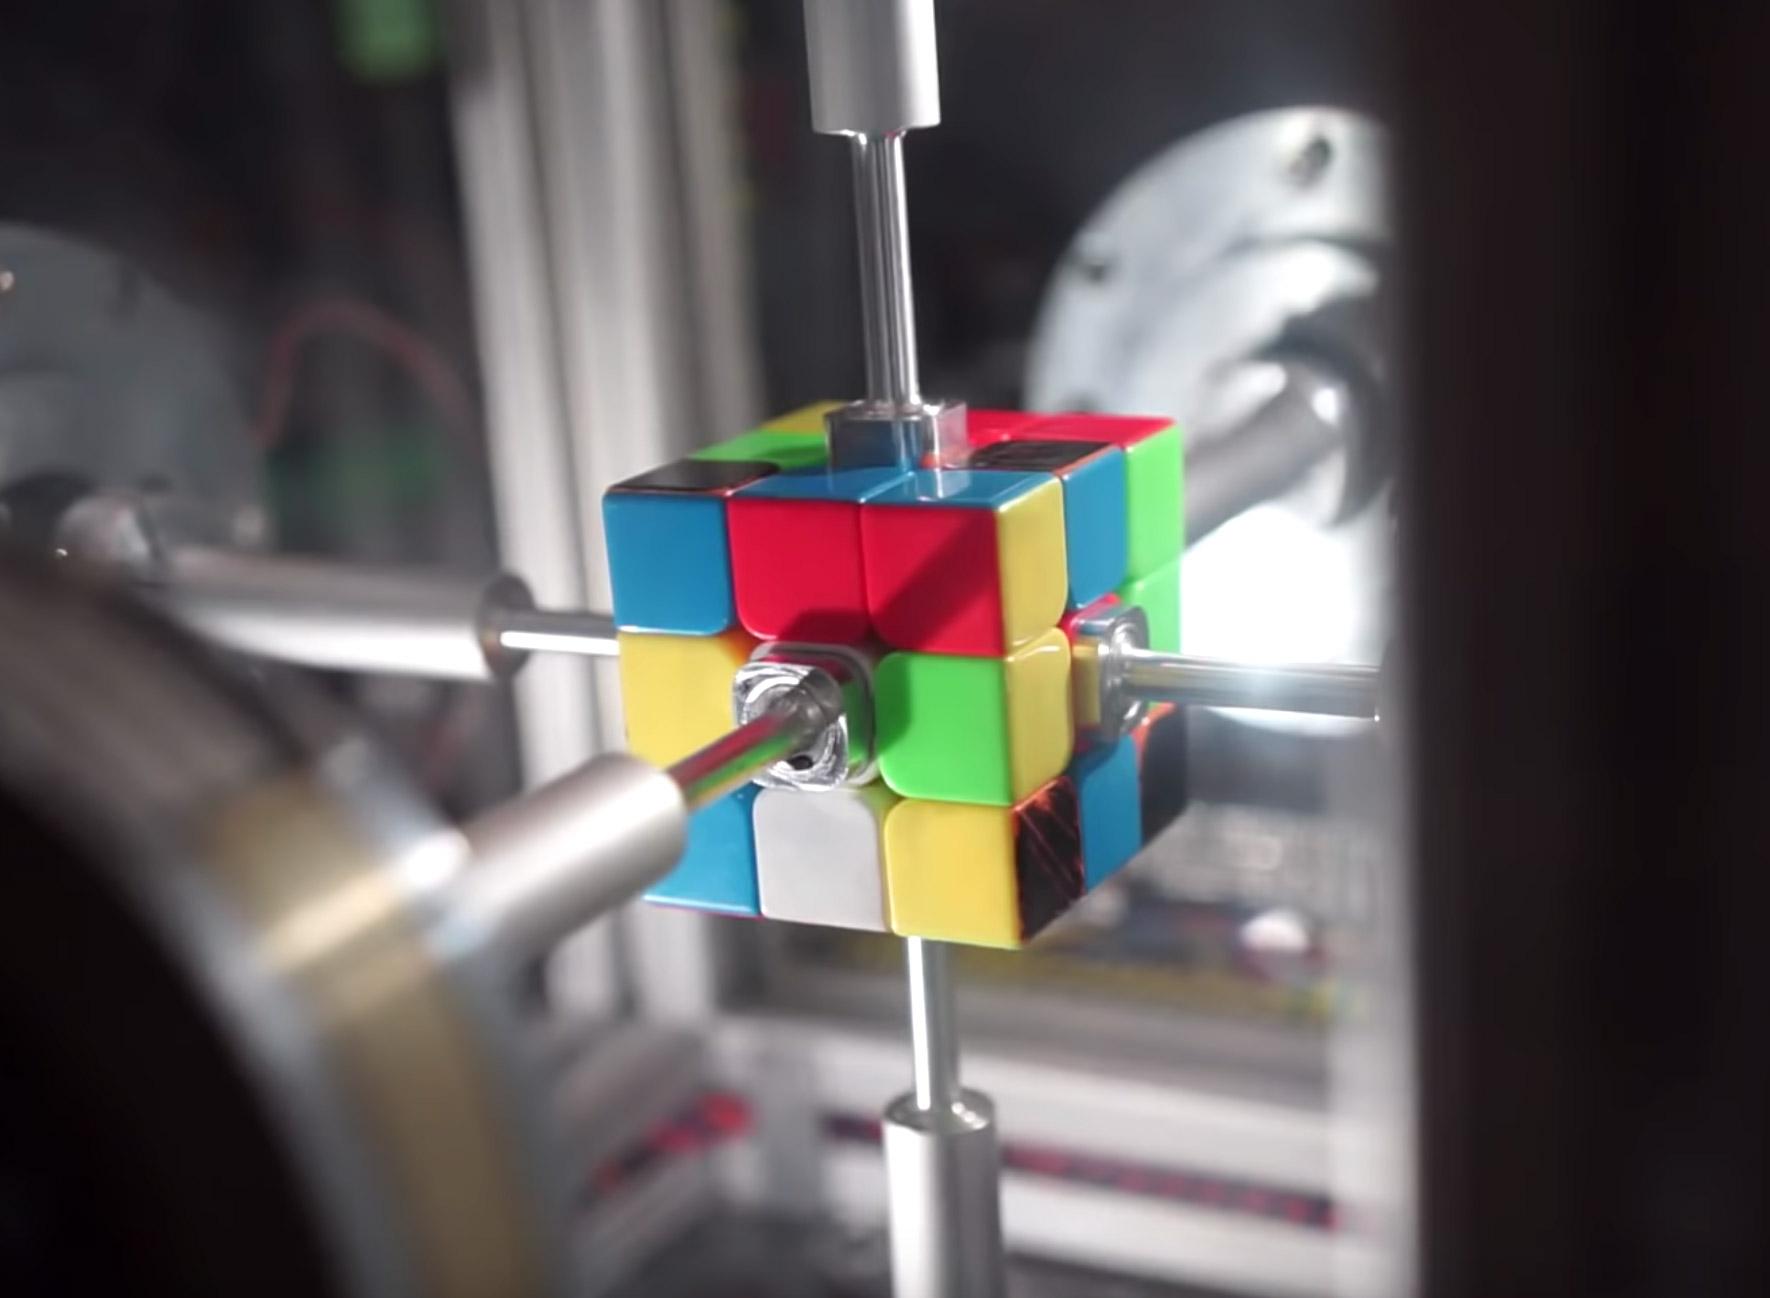 AI Rubik's Cube System